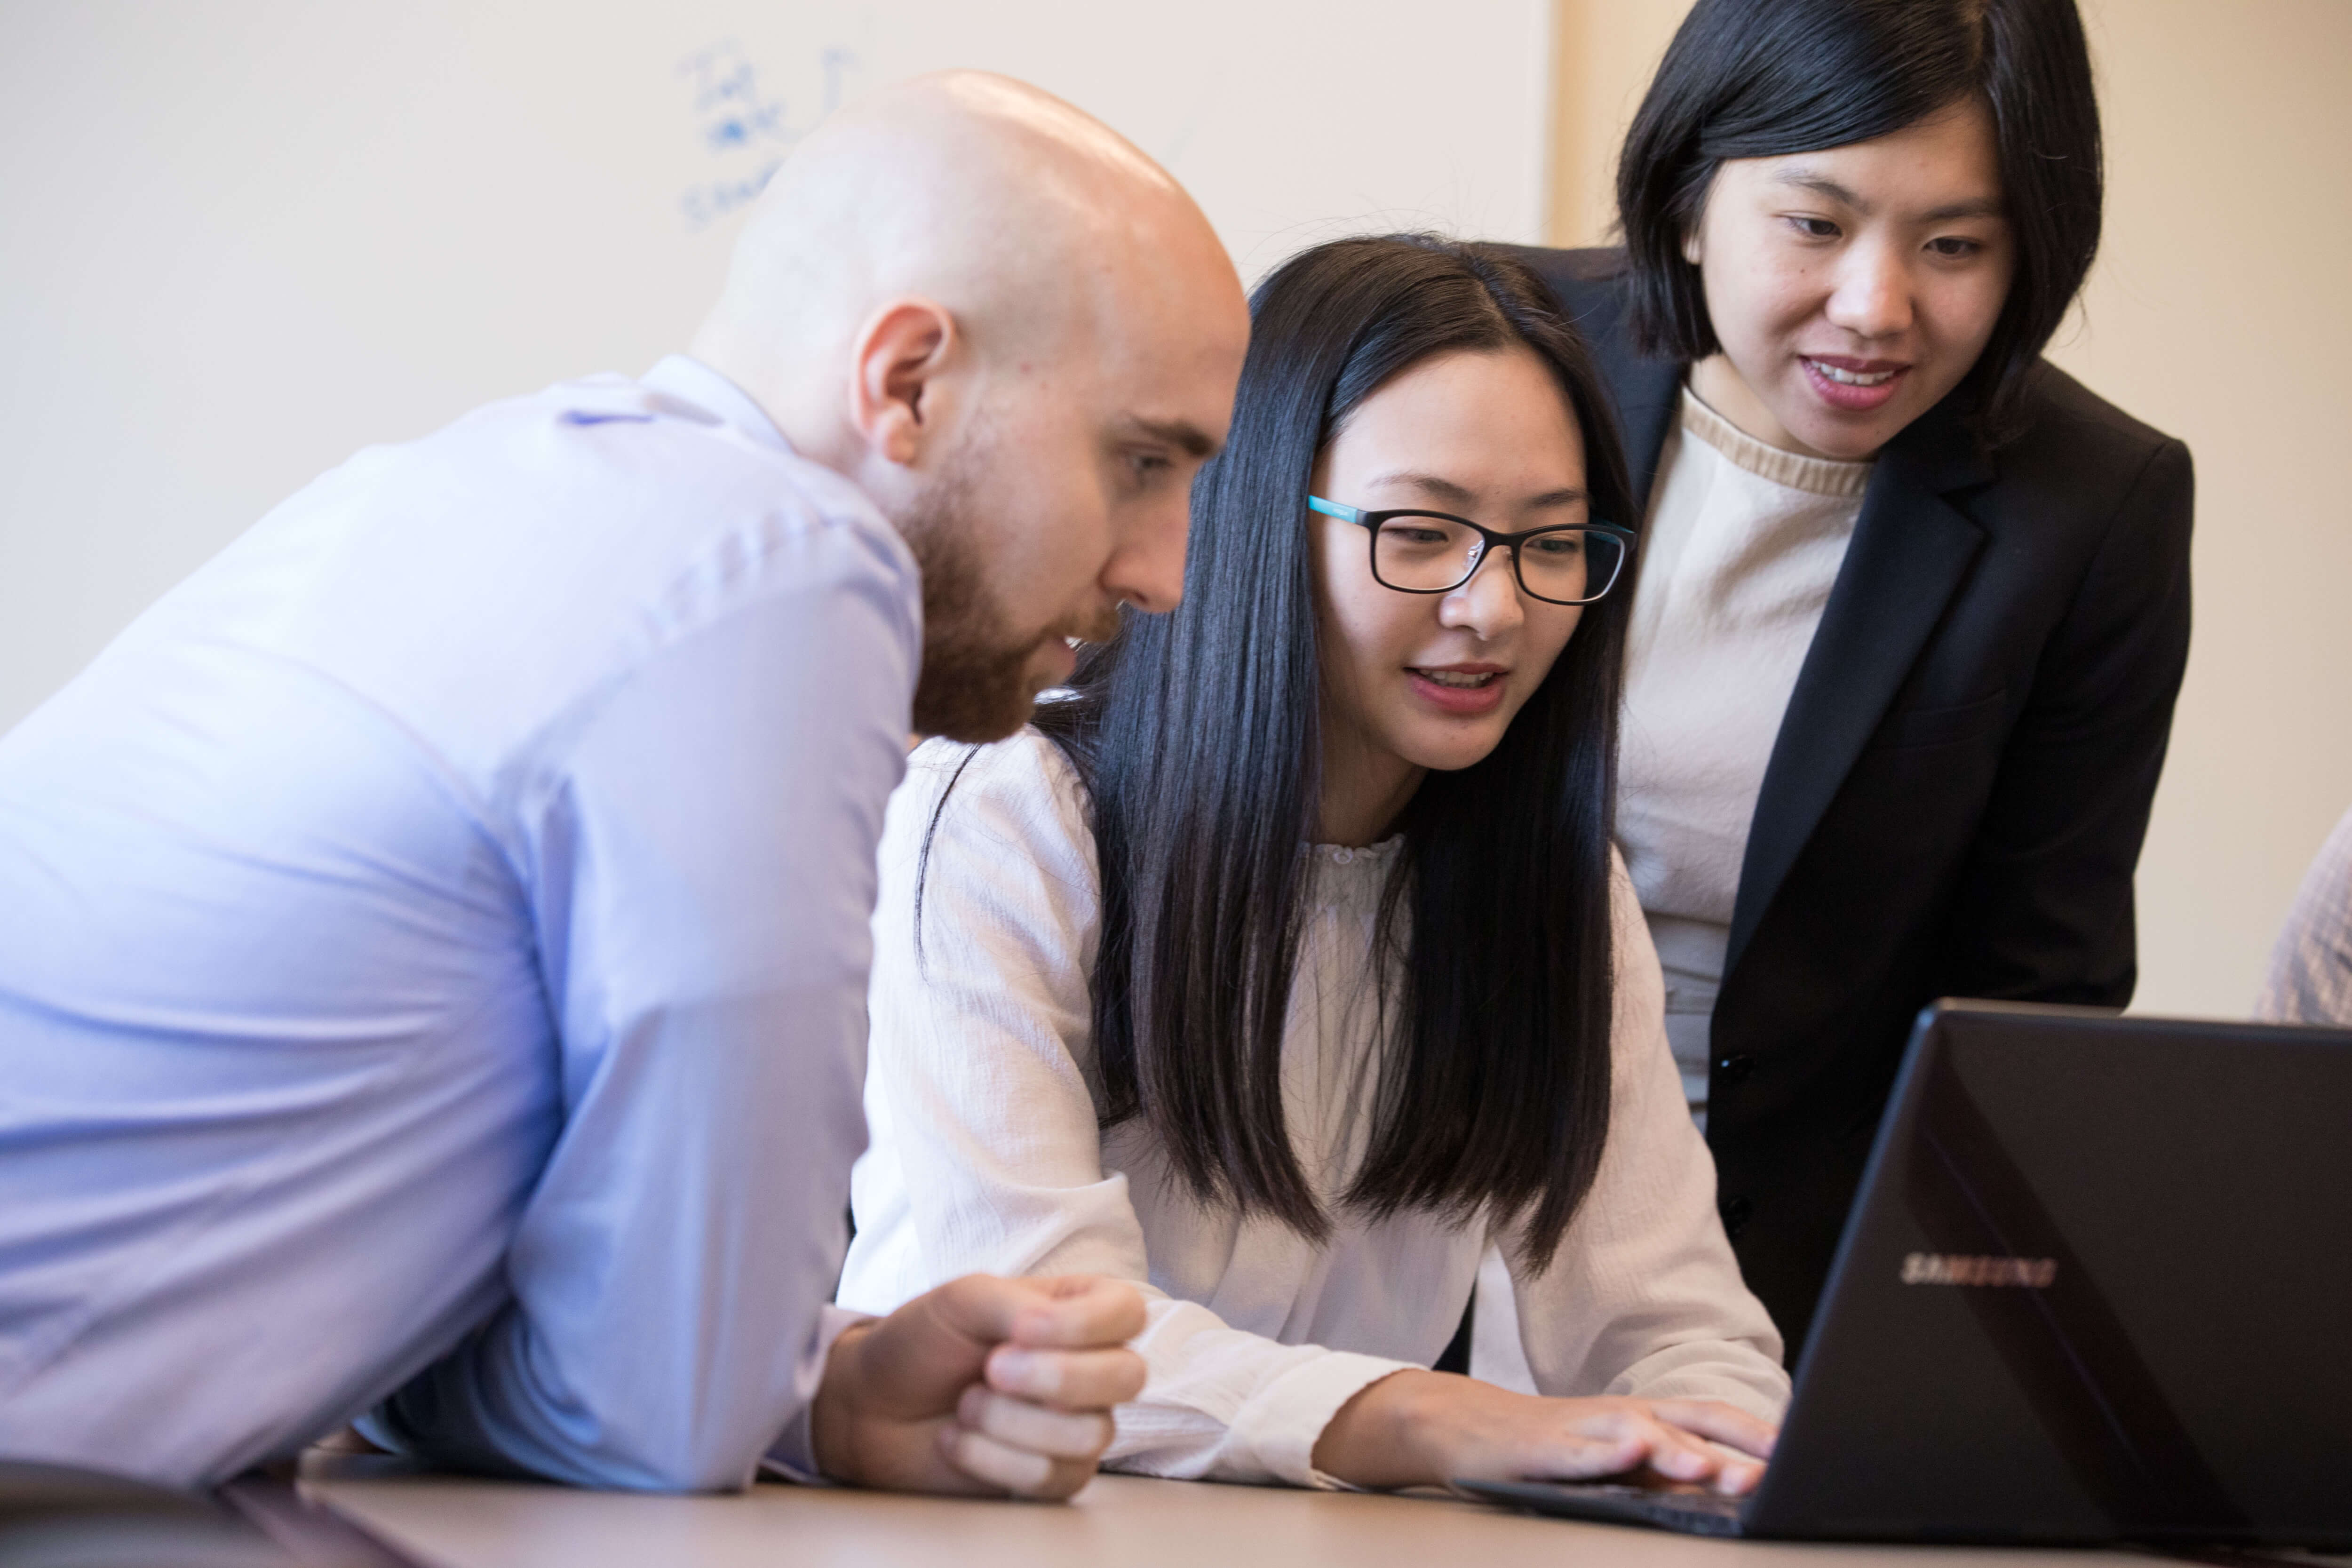 MBA programmes that create leaders in global healthcare